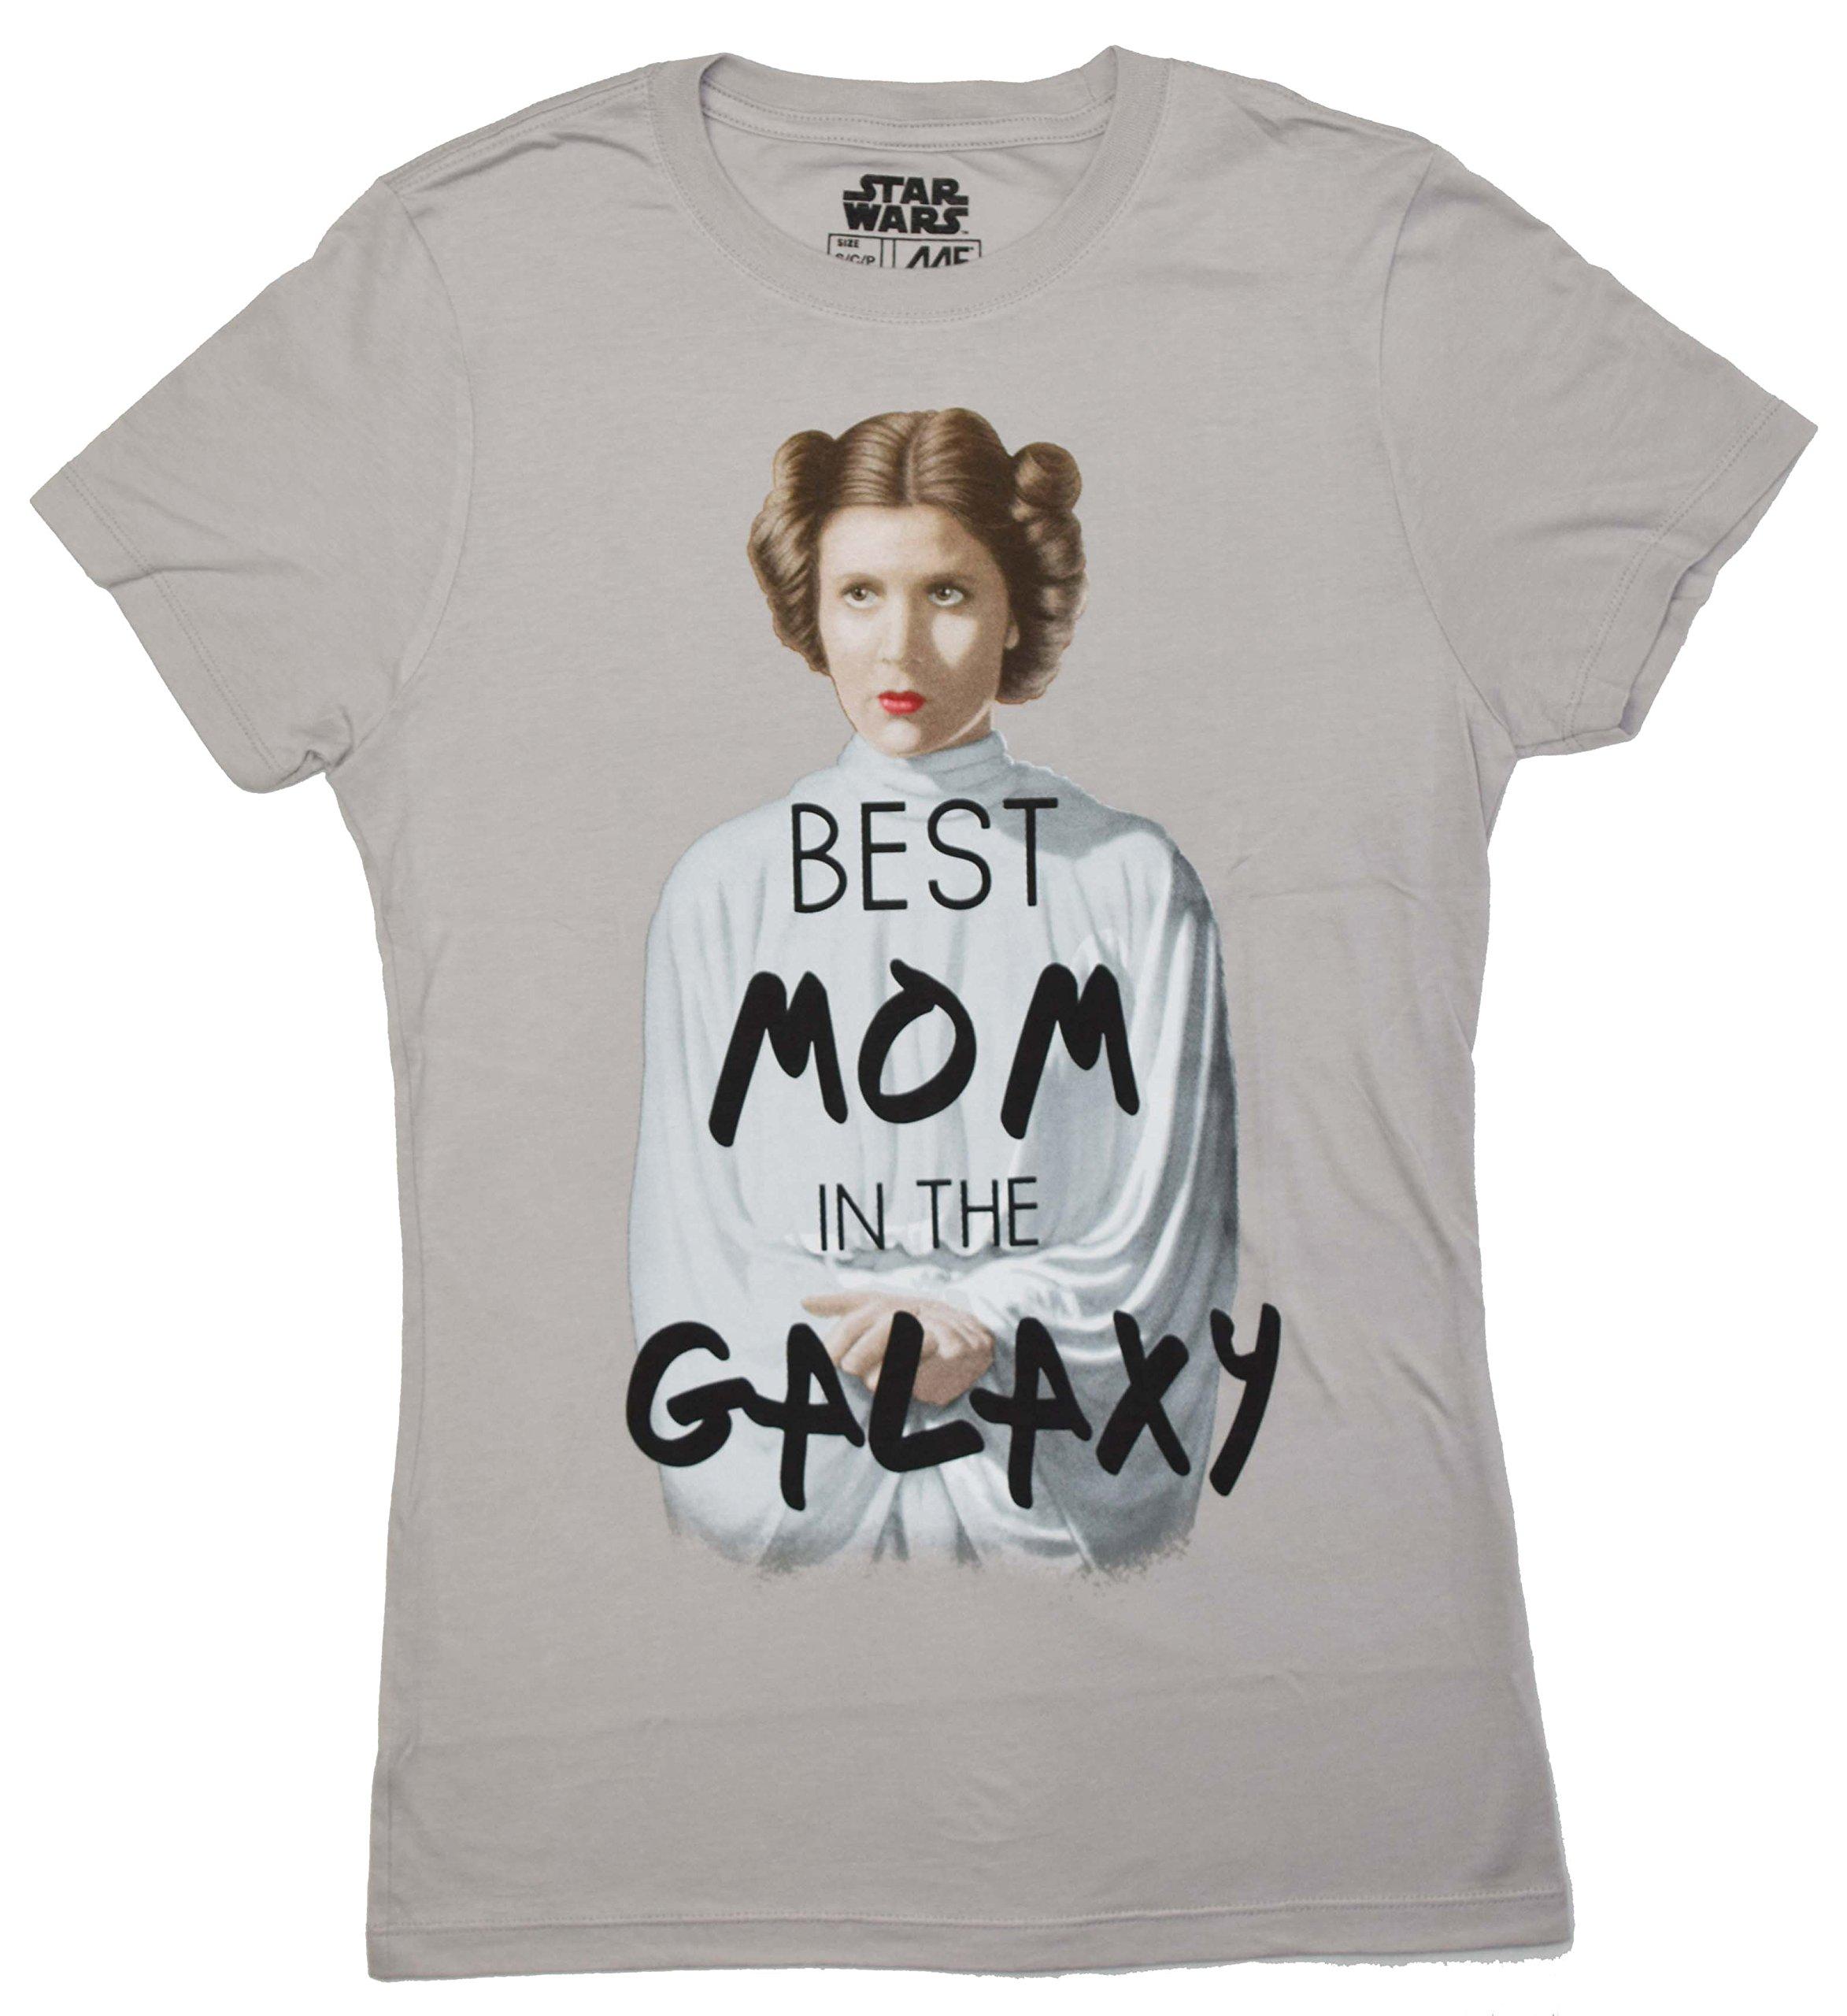 Star Wars Princess Leia Best Mom in The Galaxy Juniors T-Shirt (XXL, Silver)